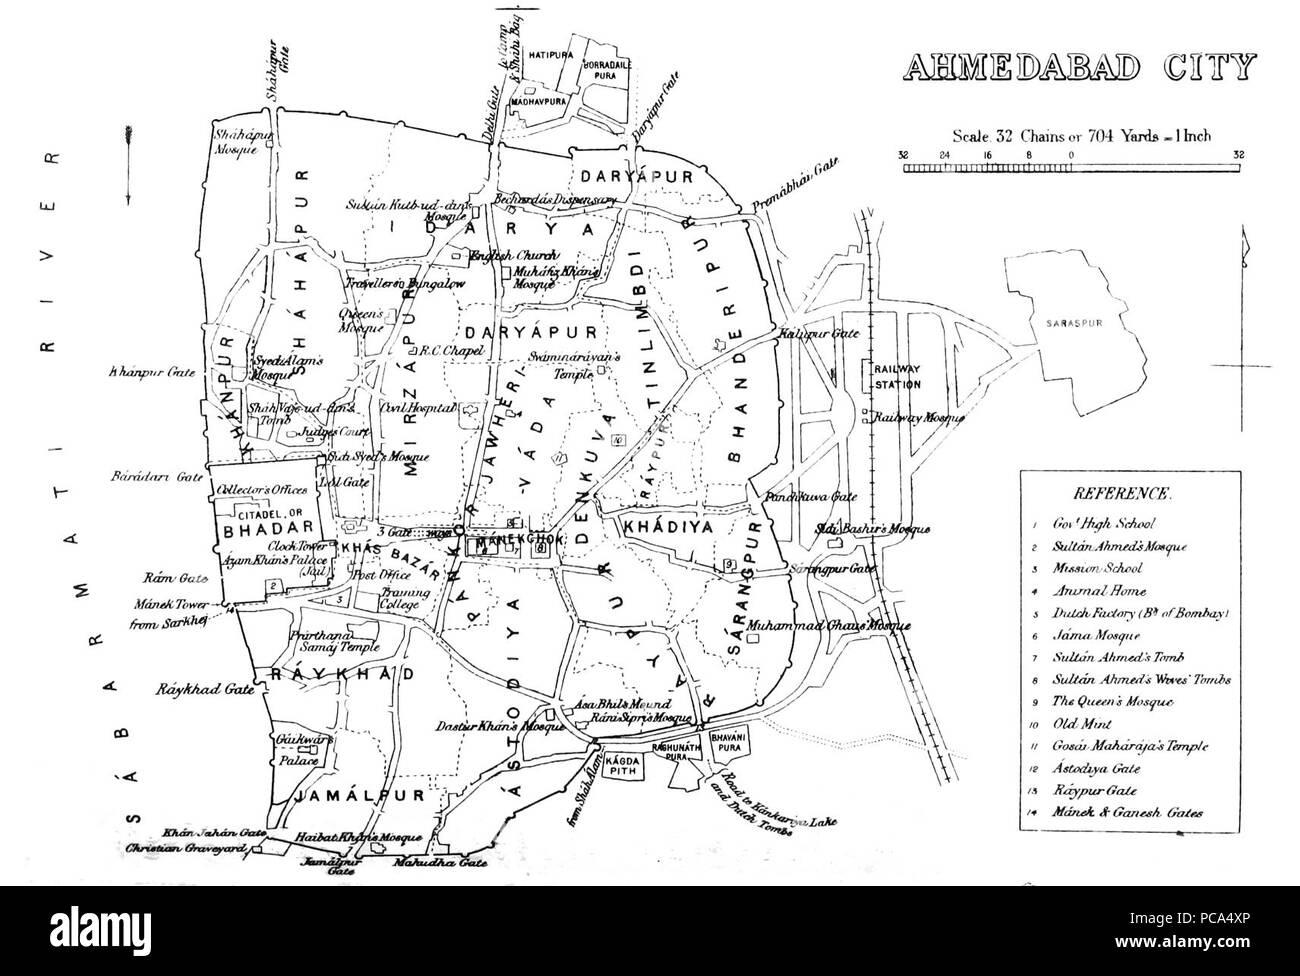 Ahmedabad 1855. - Stock Image